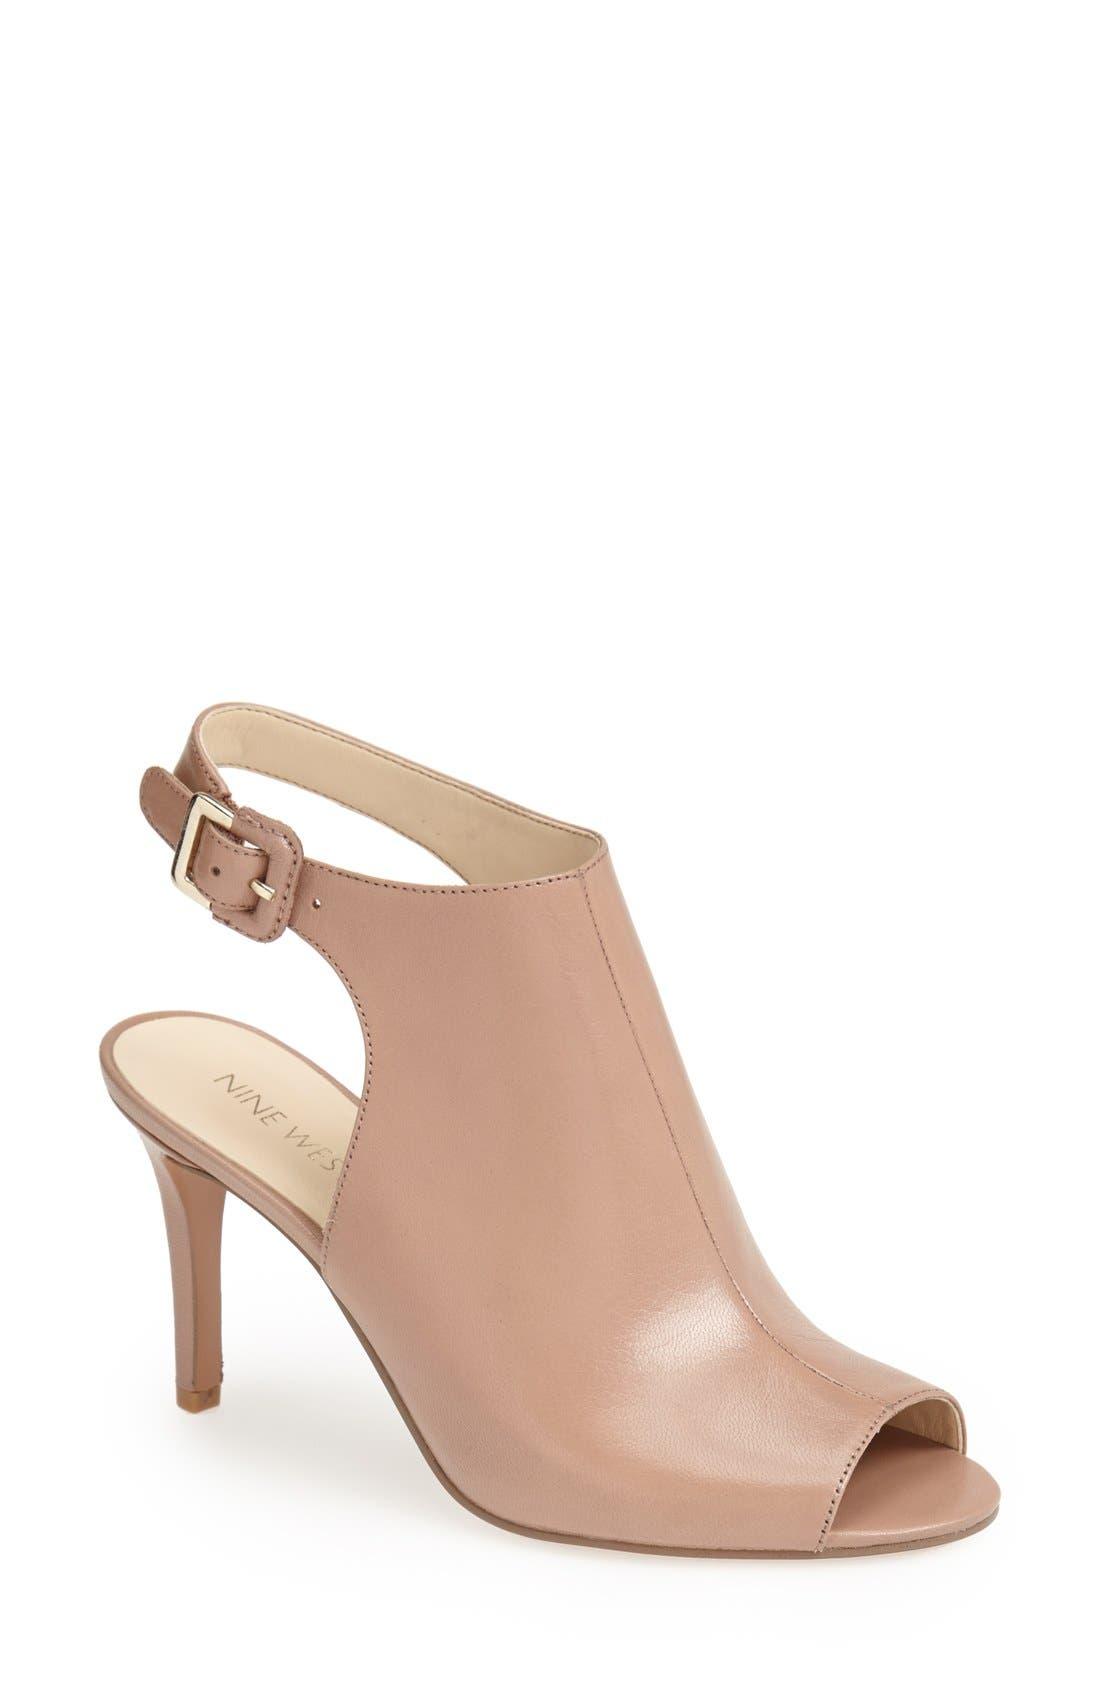 Alternate Image 1 Selected - Nine West 'Instafun' Leather Sandal (Women)